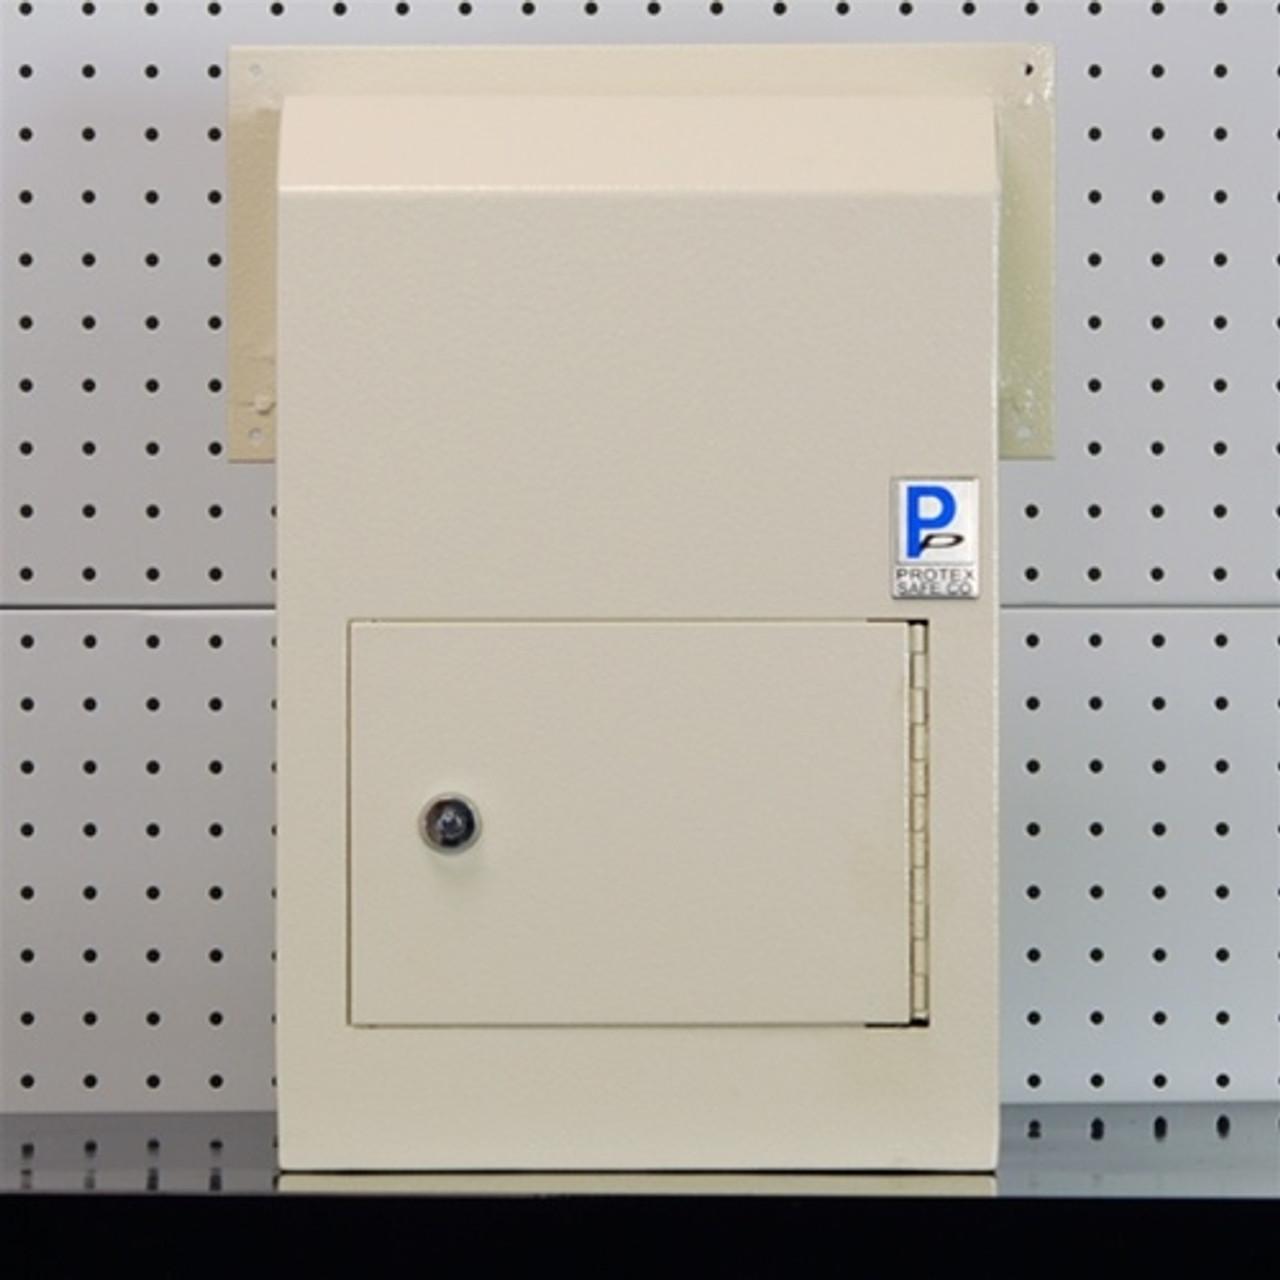 Protex WSS-159 Through the door Drop Box